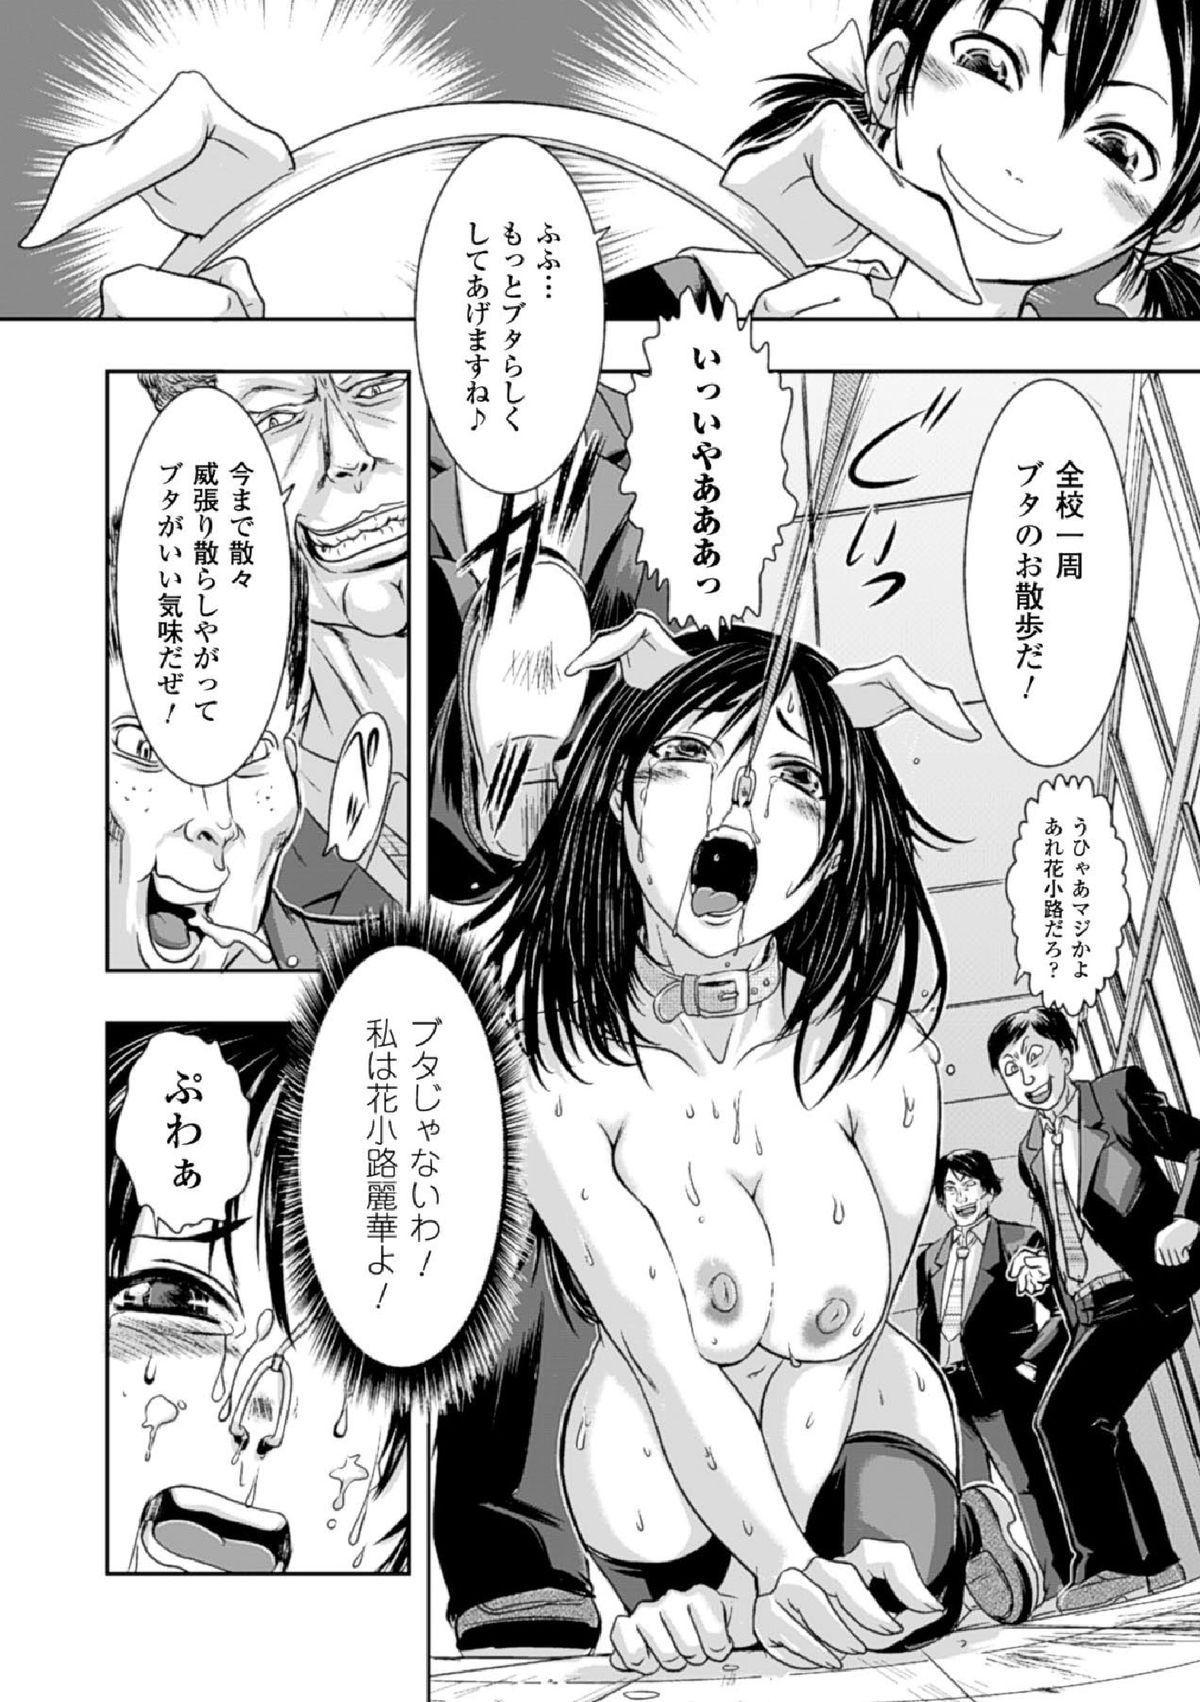 Haiboku Heroine Kaizou Choukyou Inferno 139